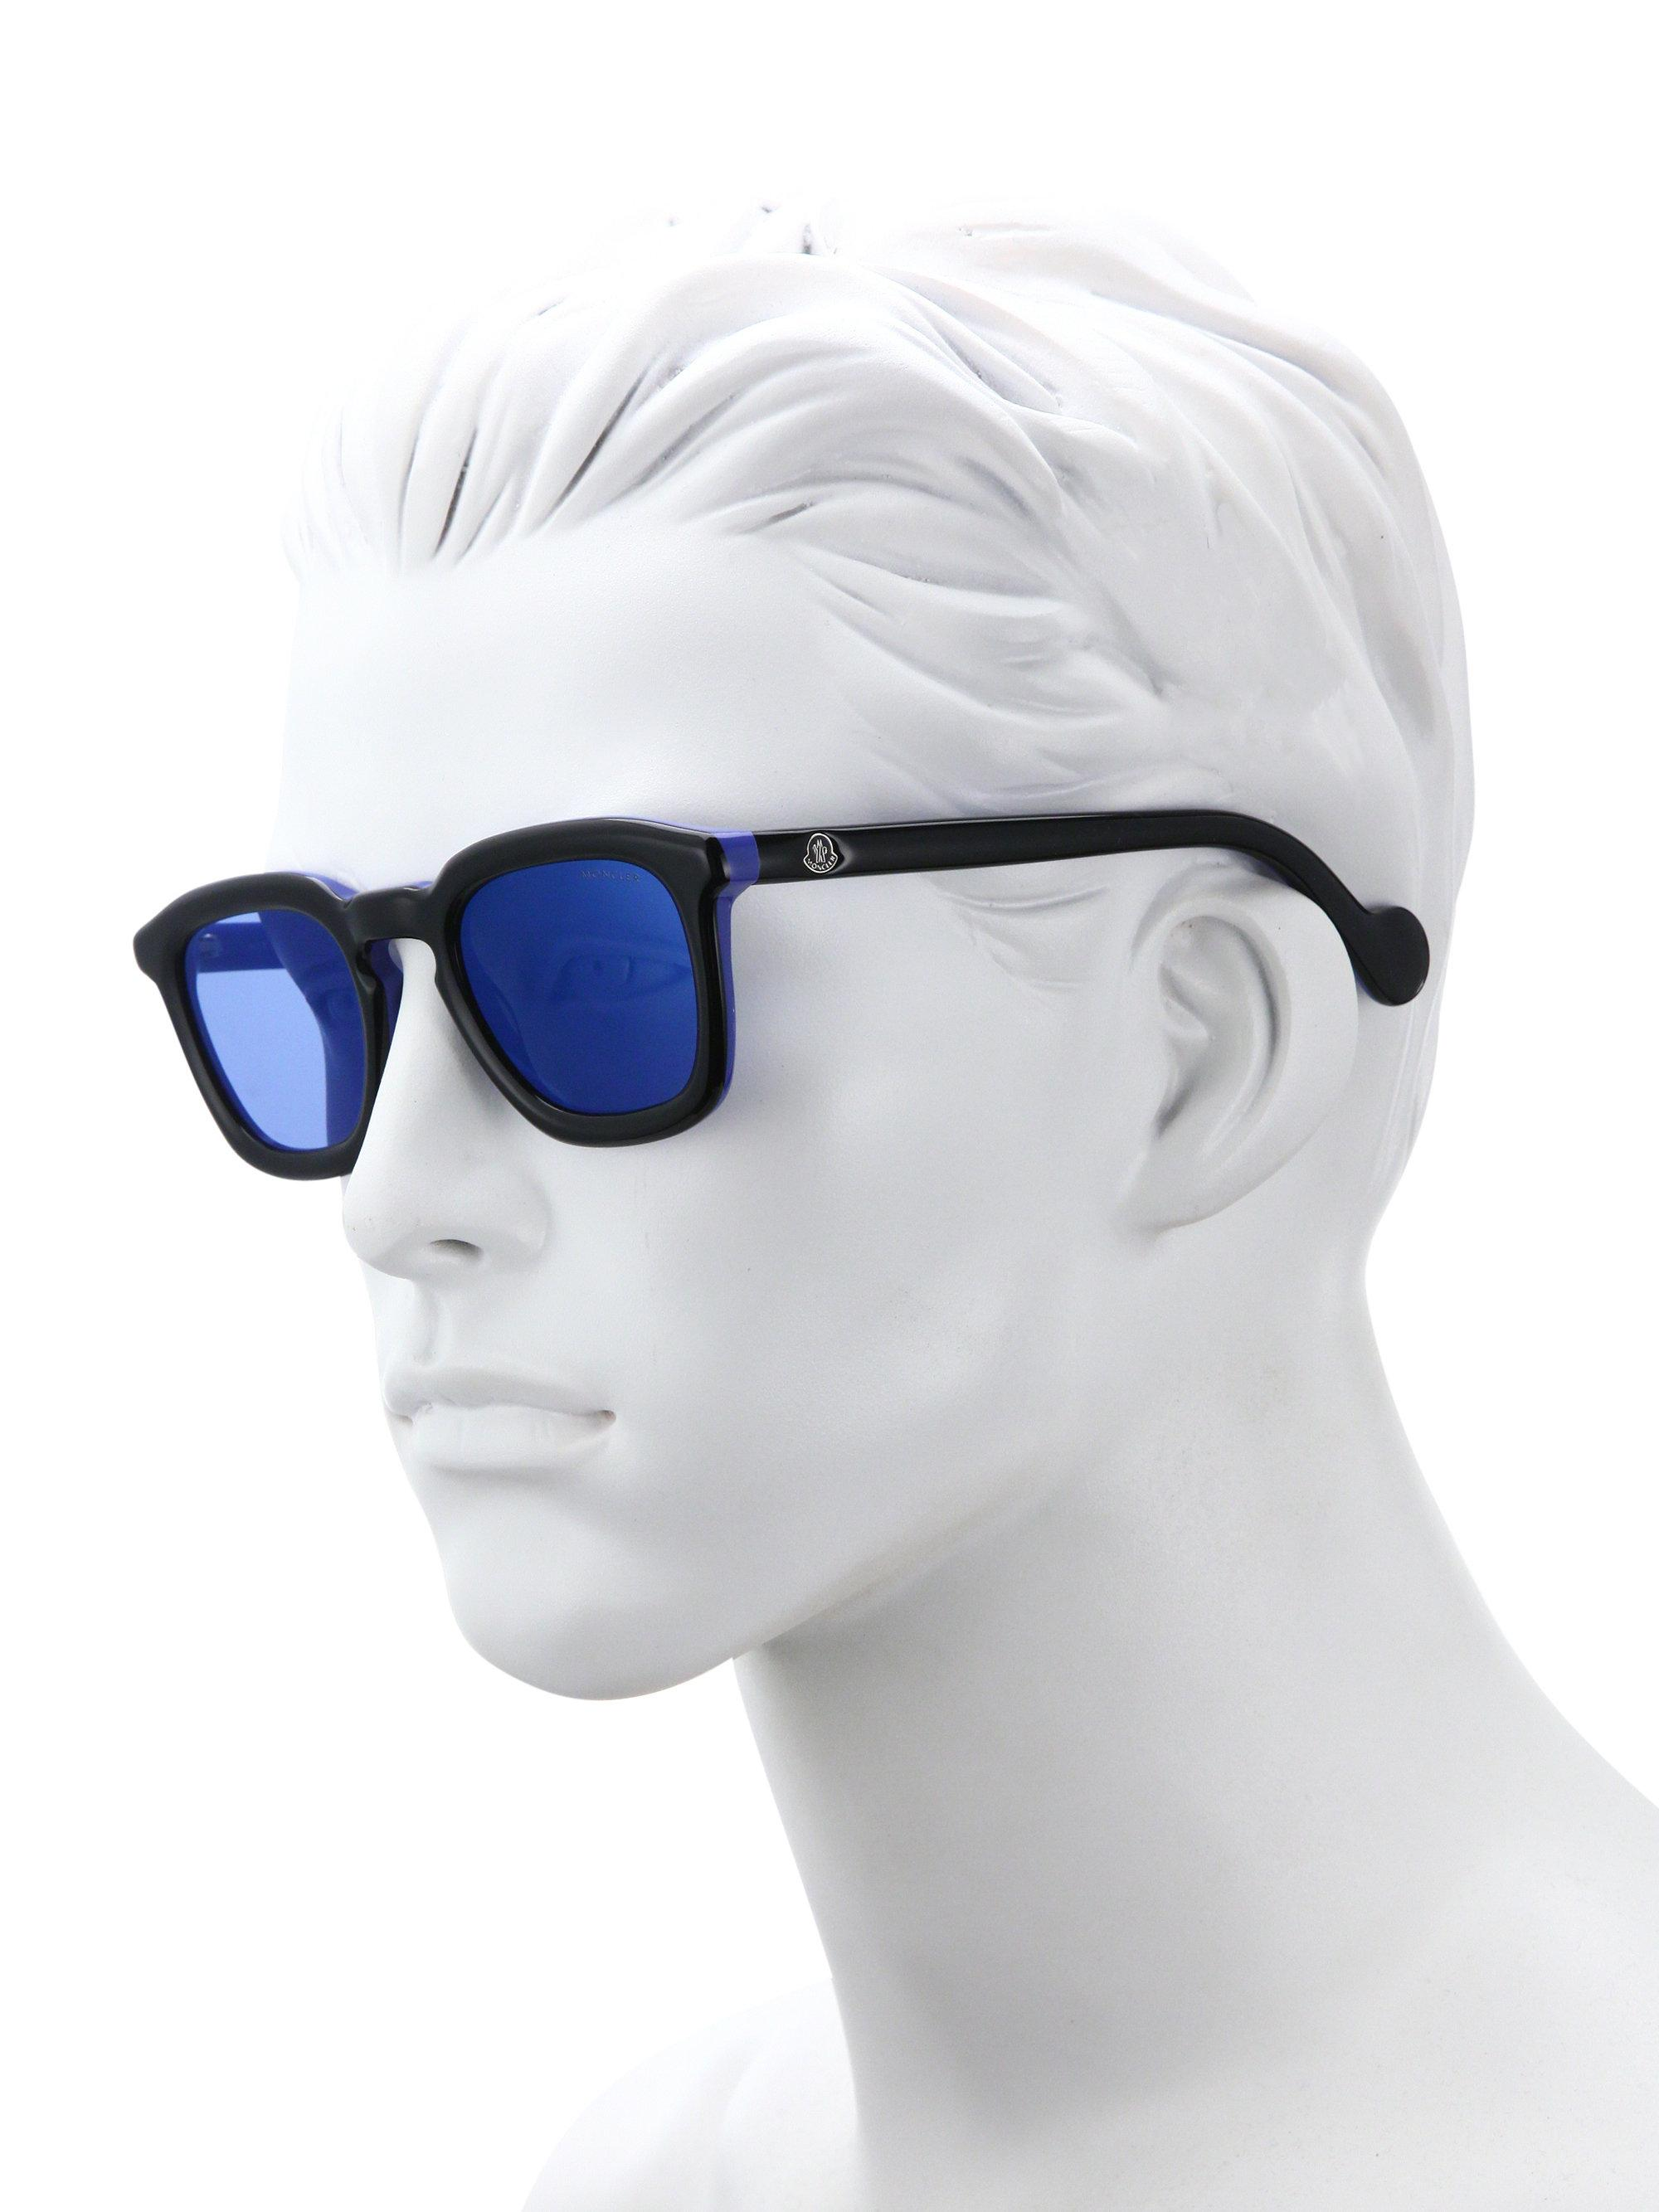 776473f15a Moncler Ml0006 Wayfarer Sunglasses in Blue for Men - Lyst